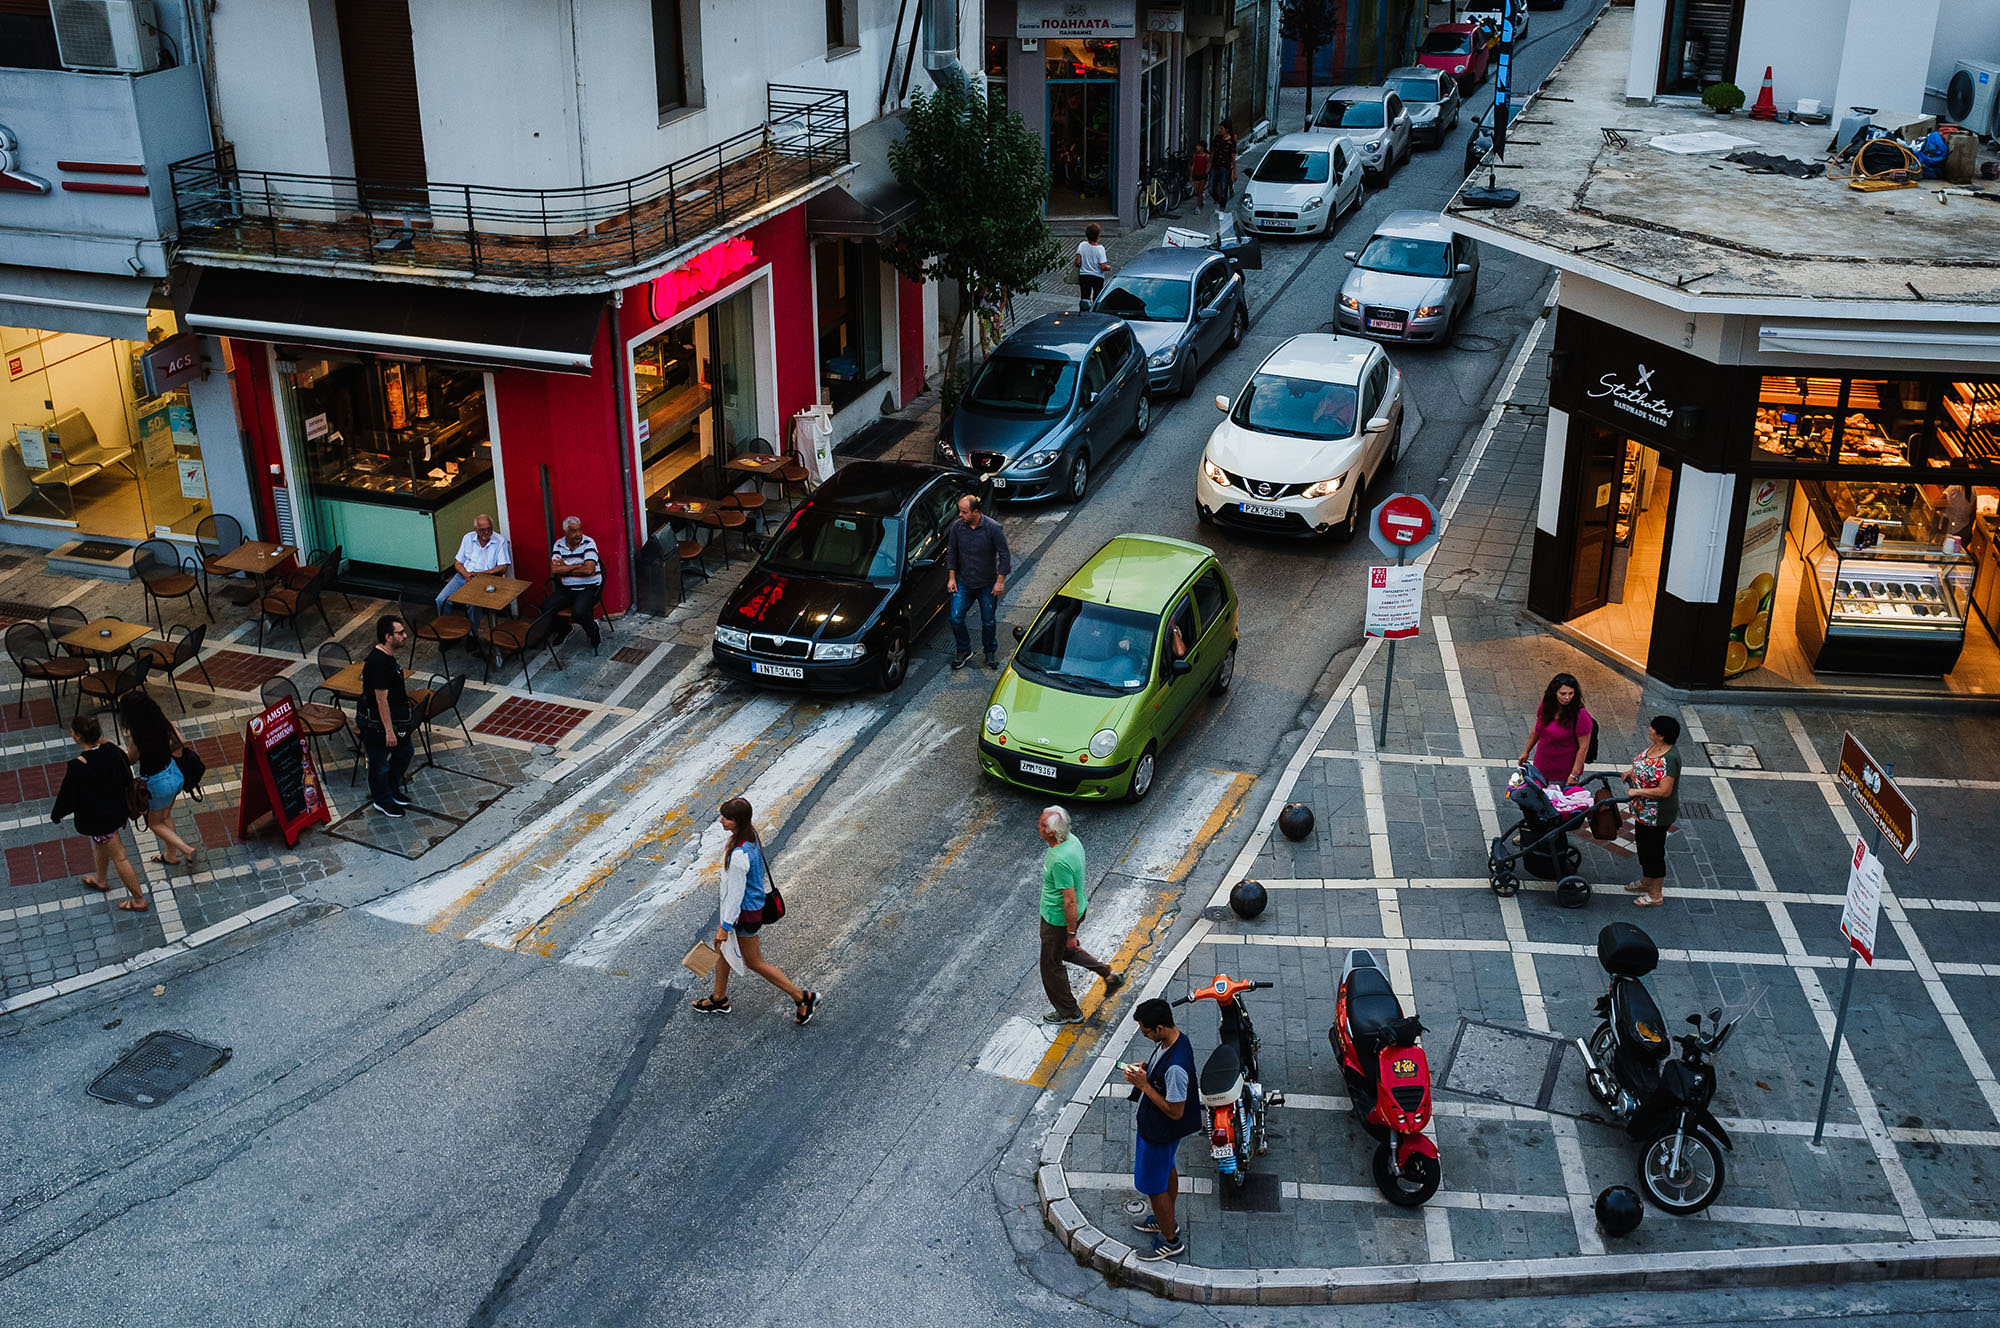 Greece Ioannina street photogtraphy